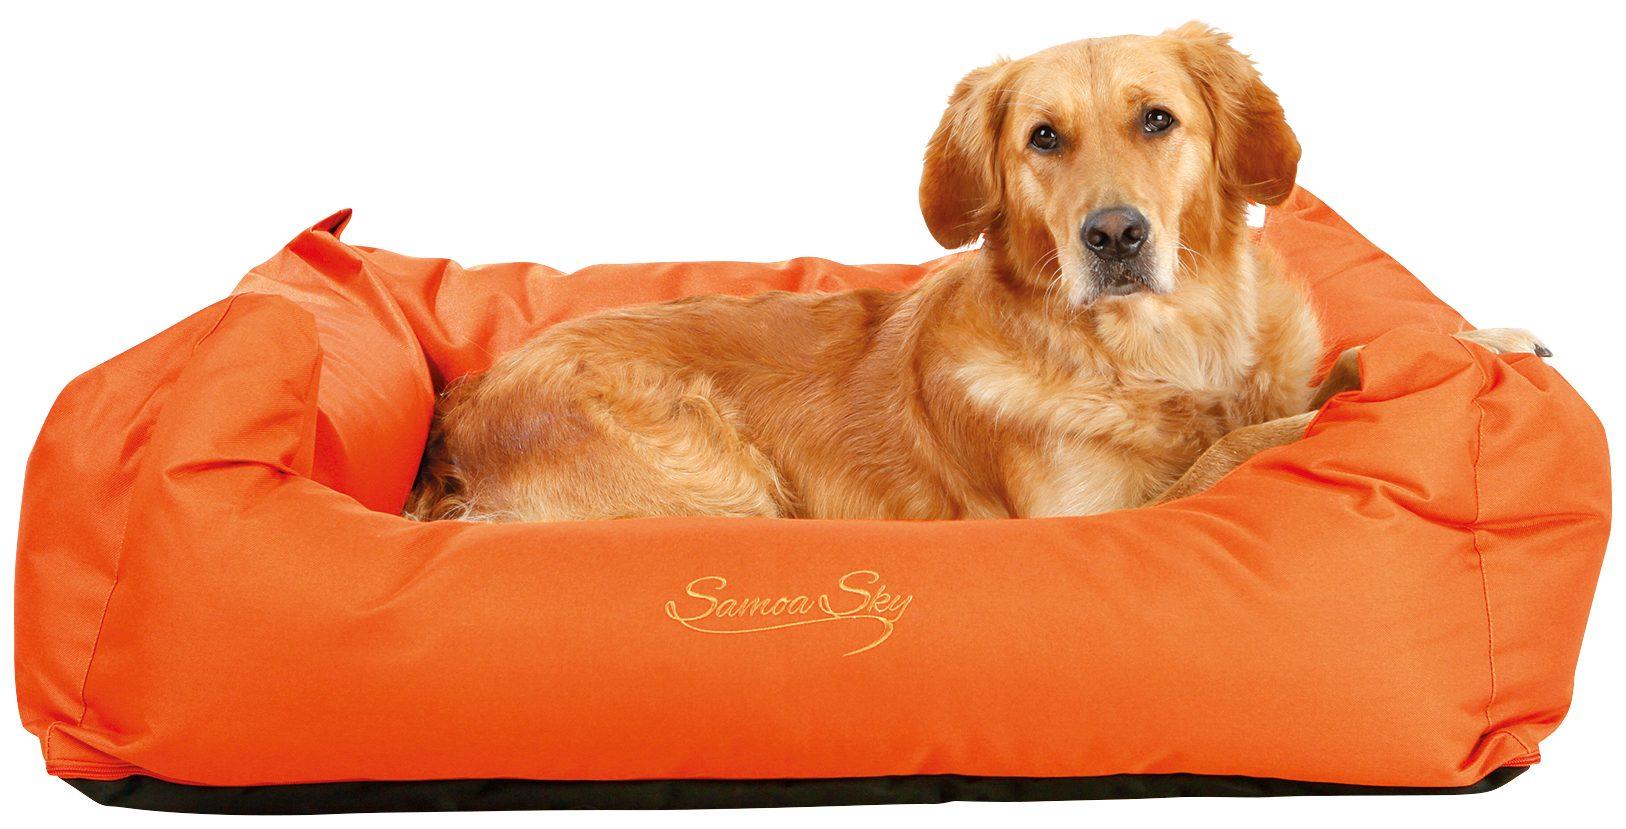 Hunde-Bett »Samoa Sky«, BxL: 80x65 cm, orange